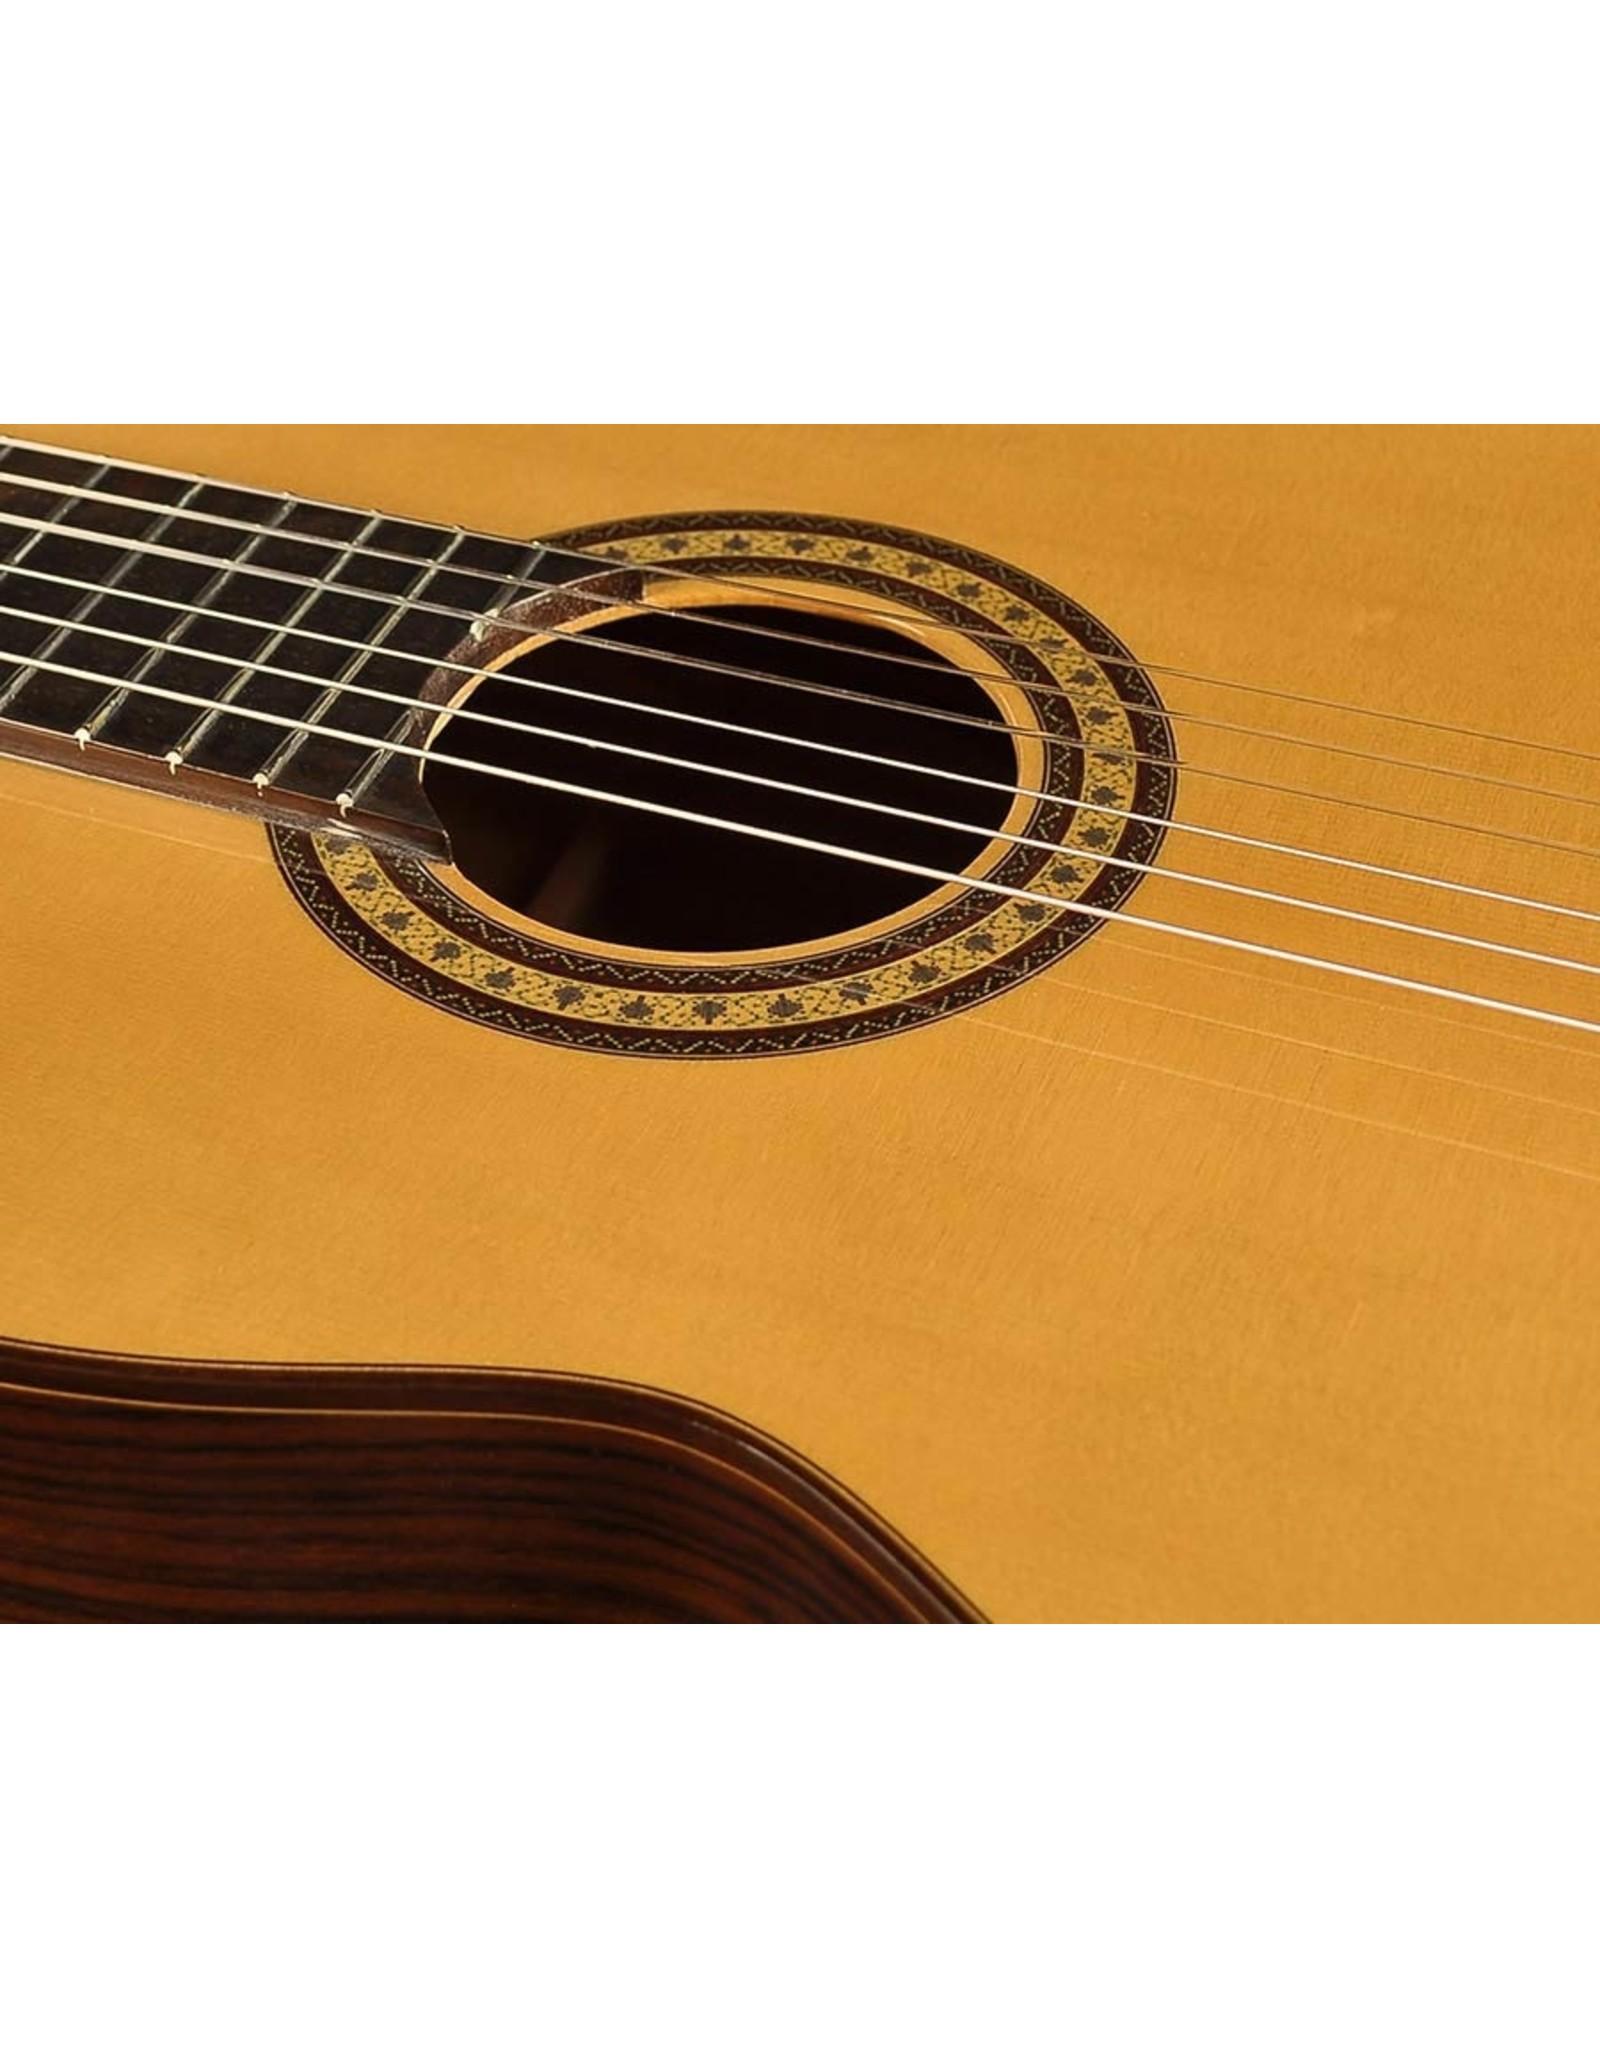 Esteve Esteve 6PS-SP Classic Series klassieke gitaar massief spruce top